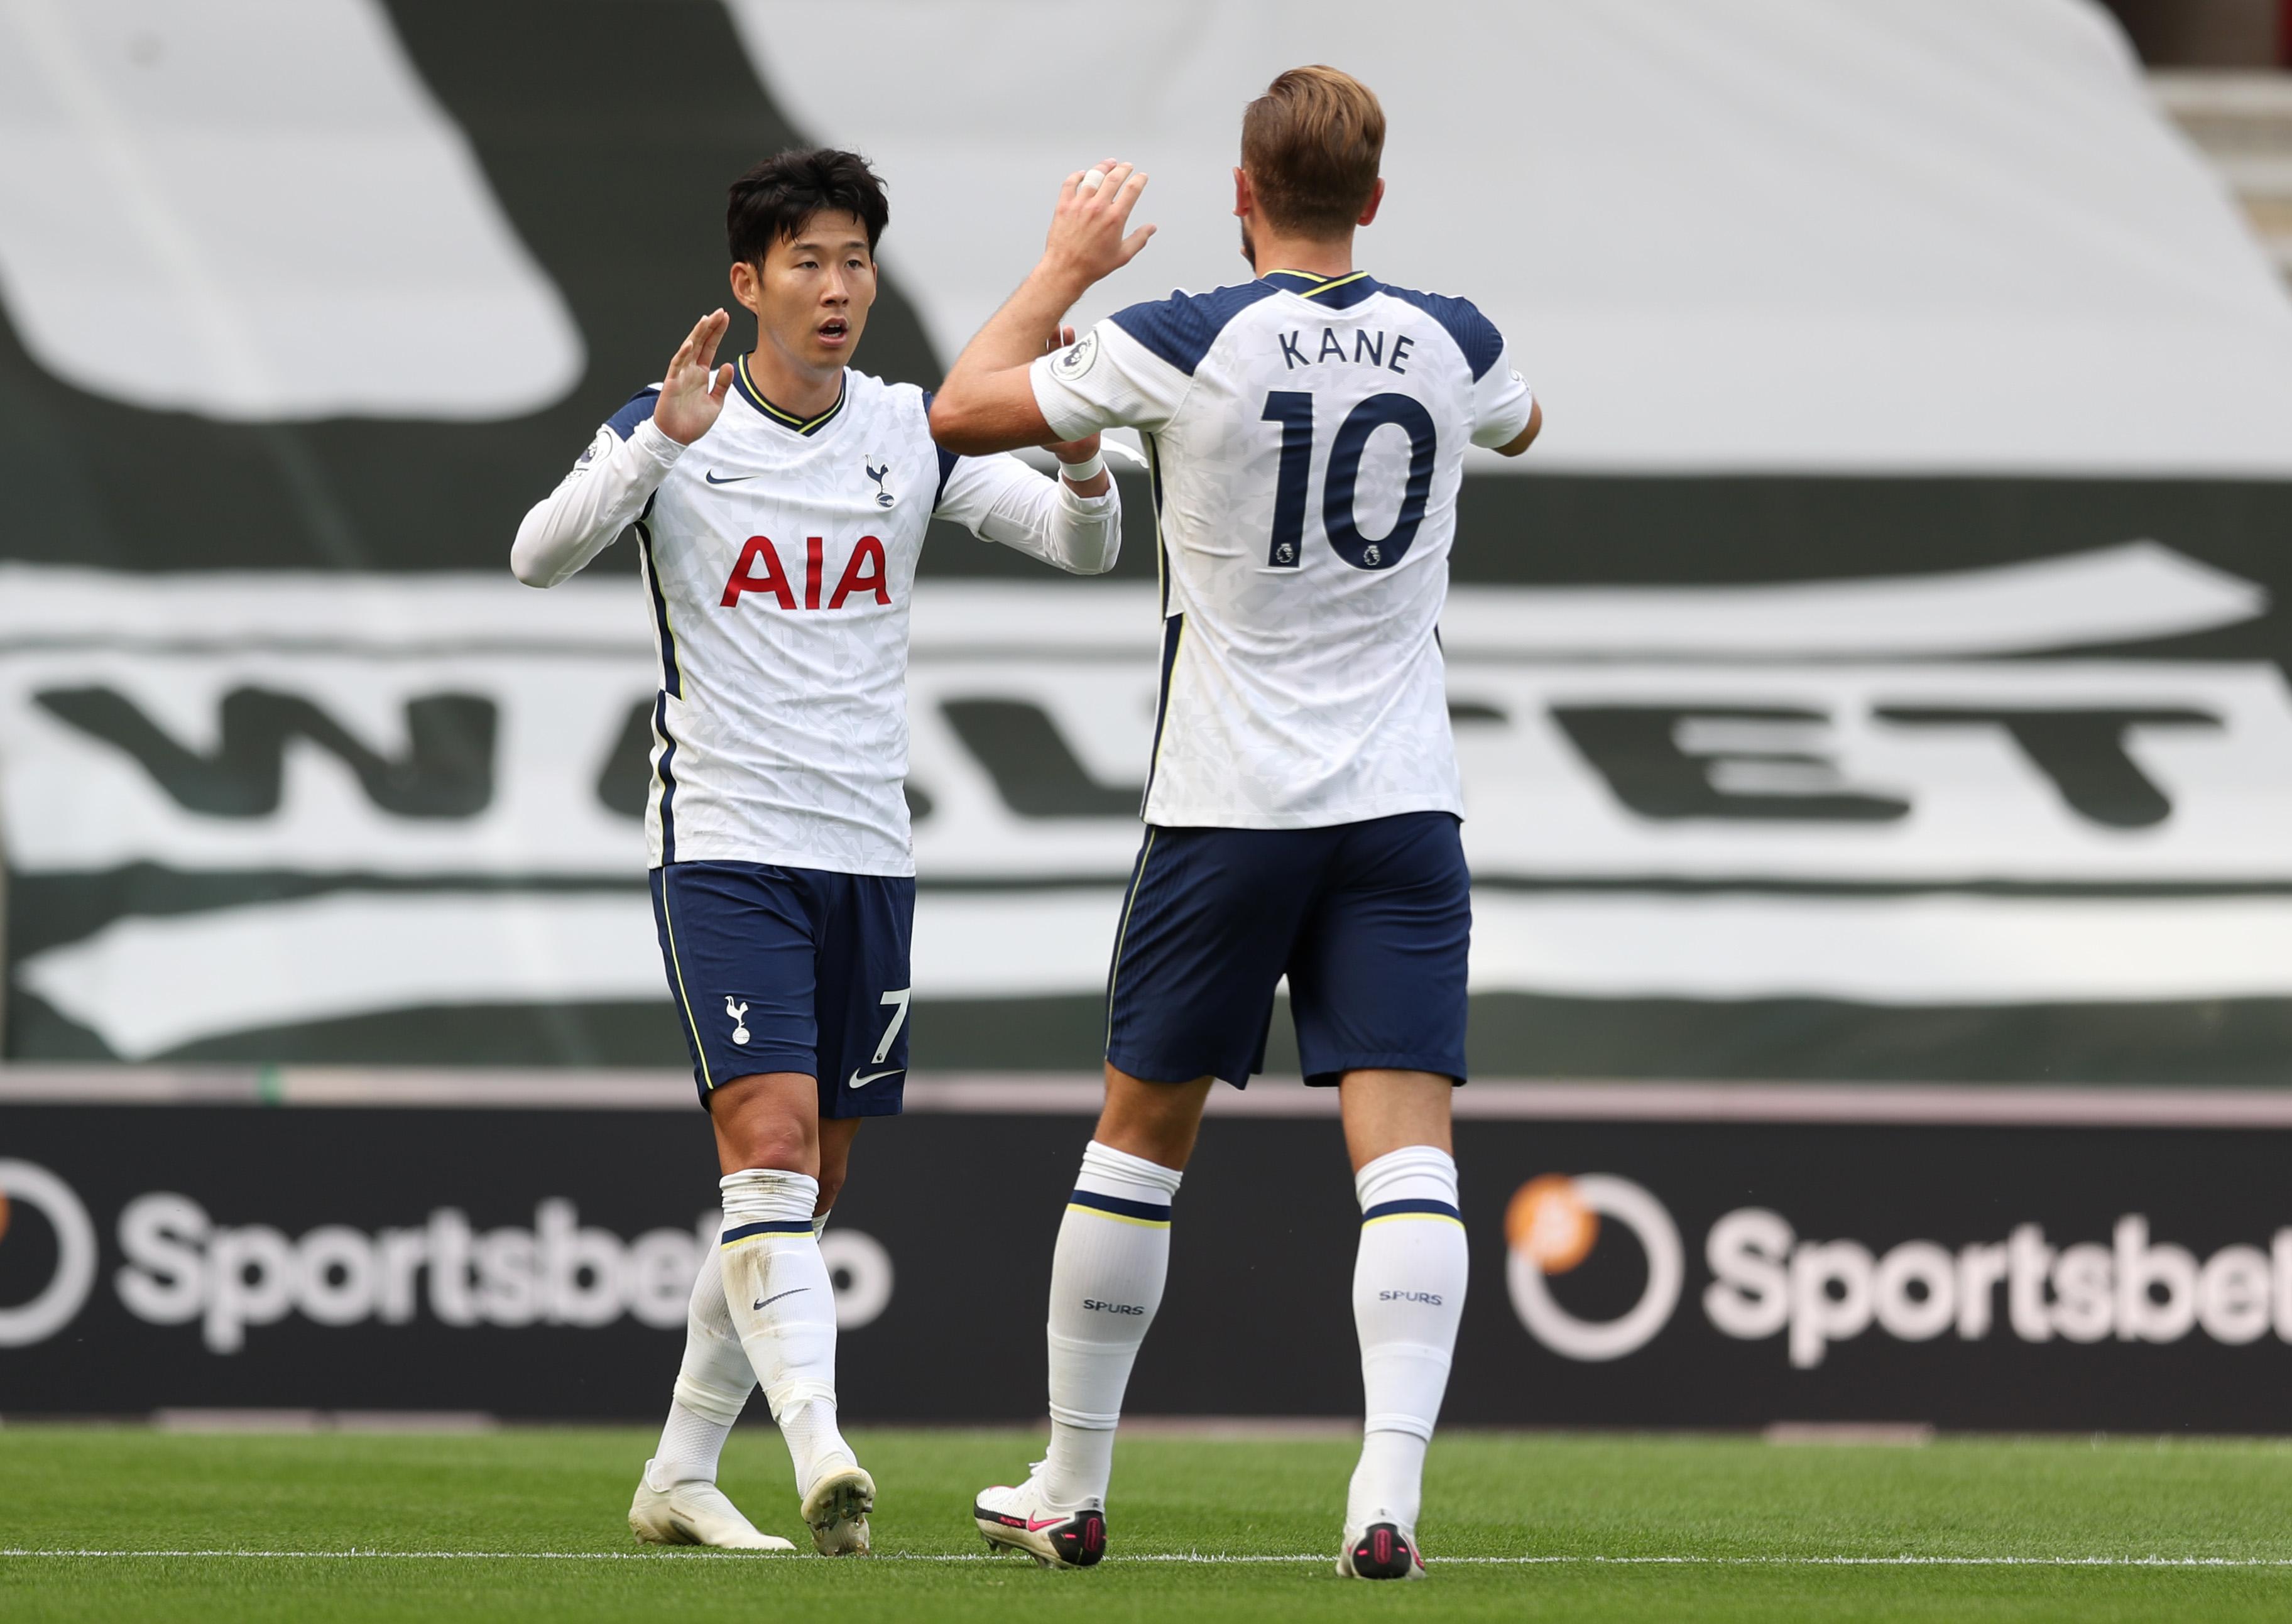 Southampton v Tottenham Hotspur - Premier League